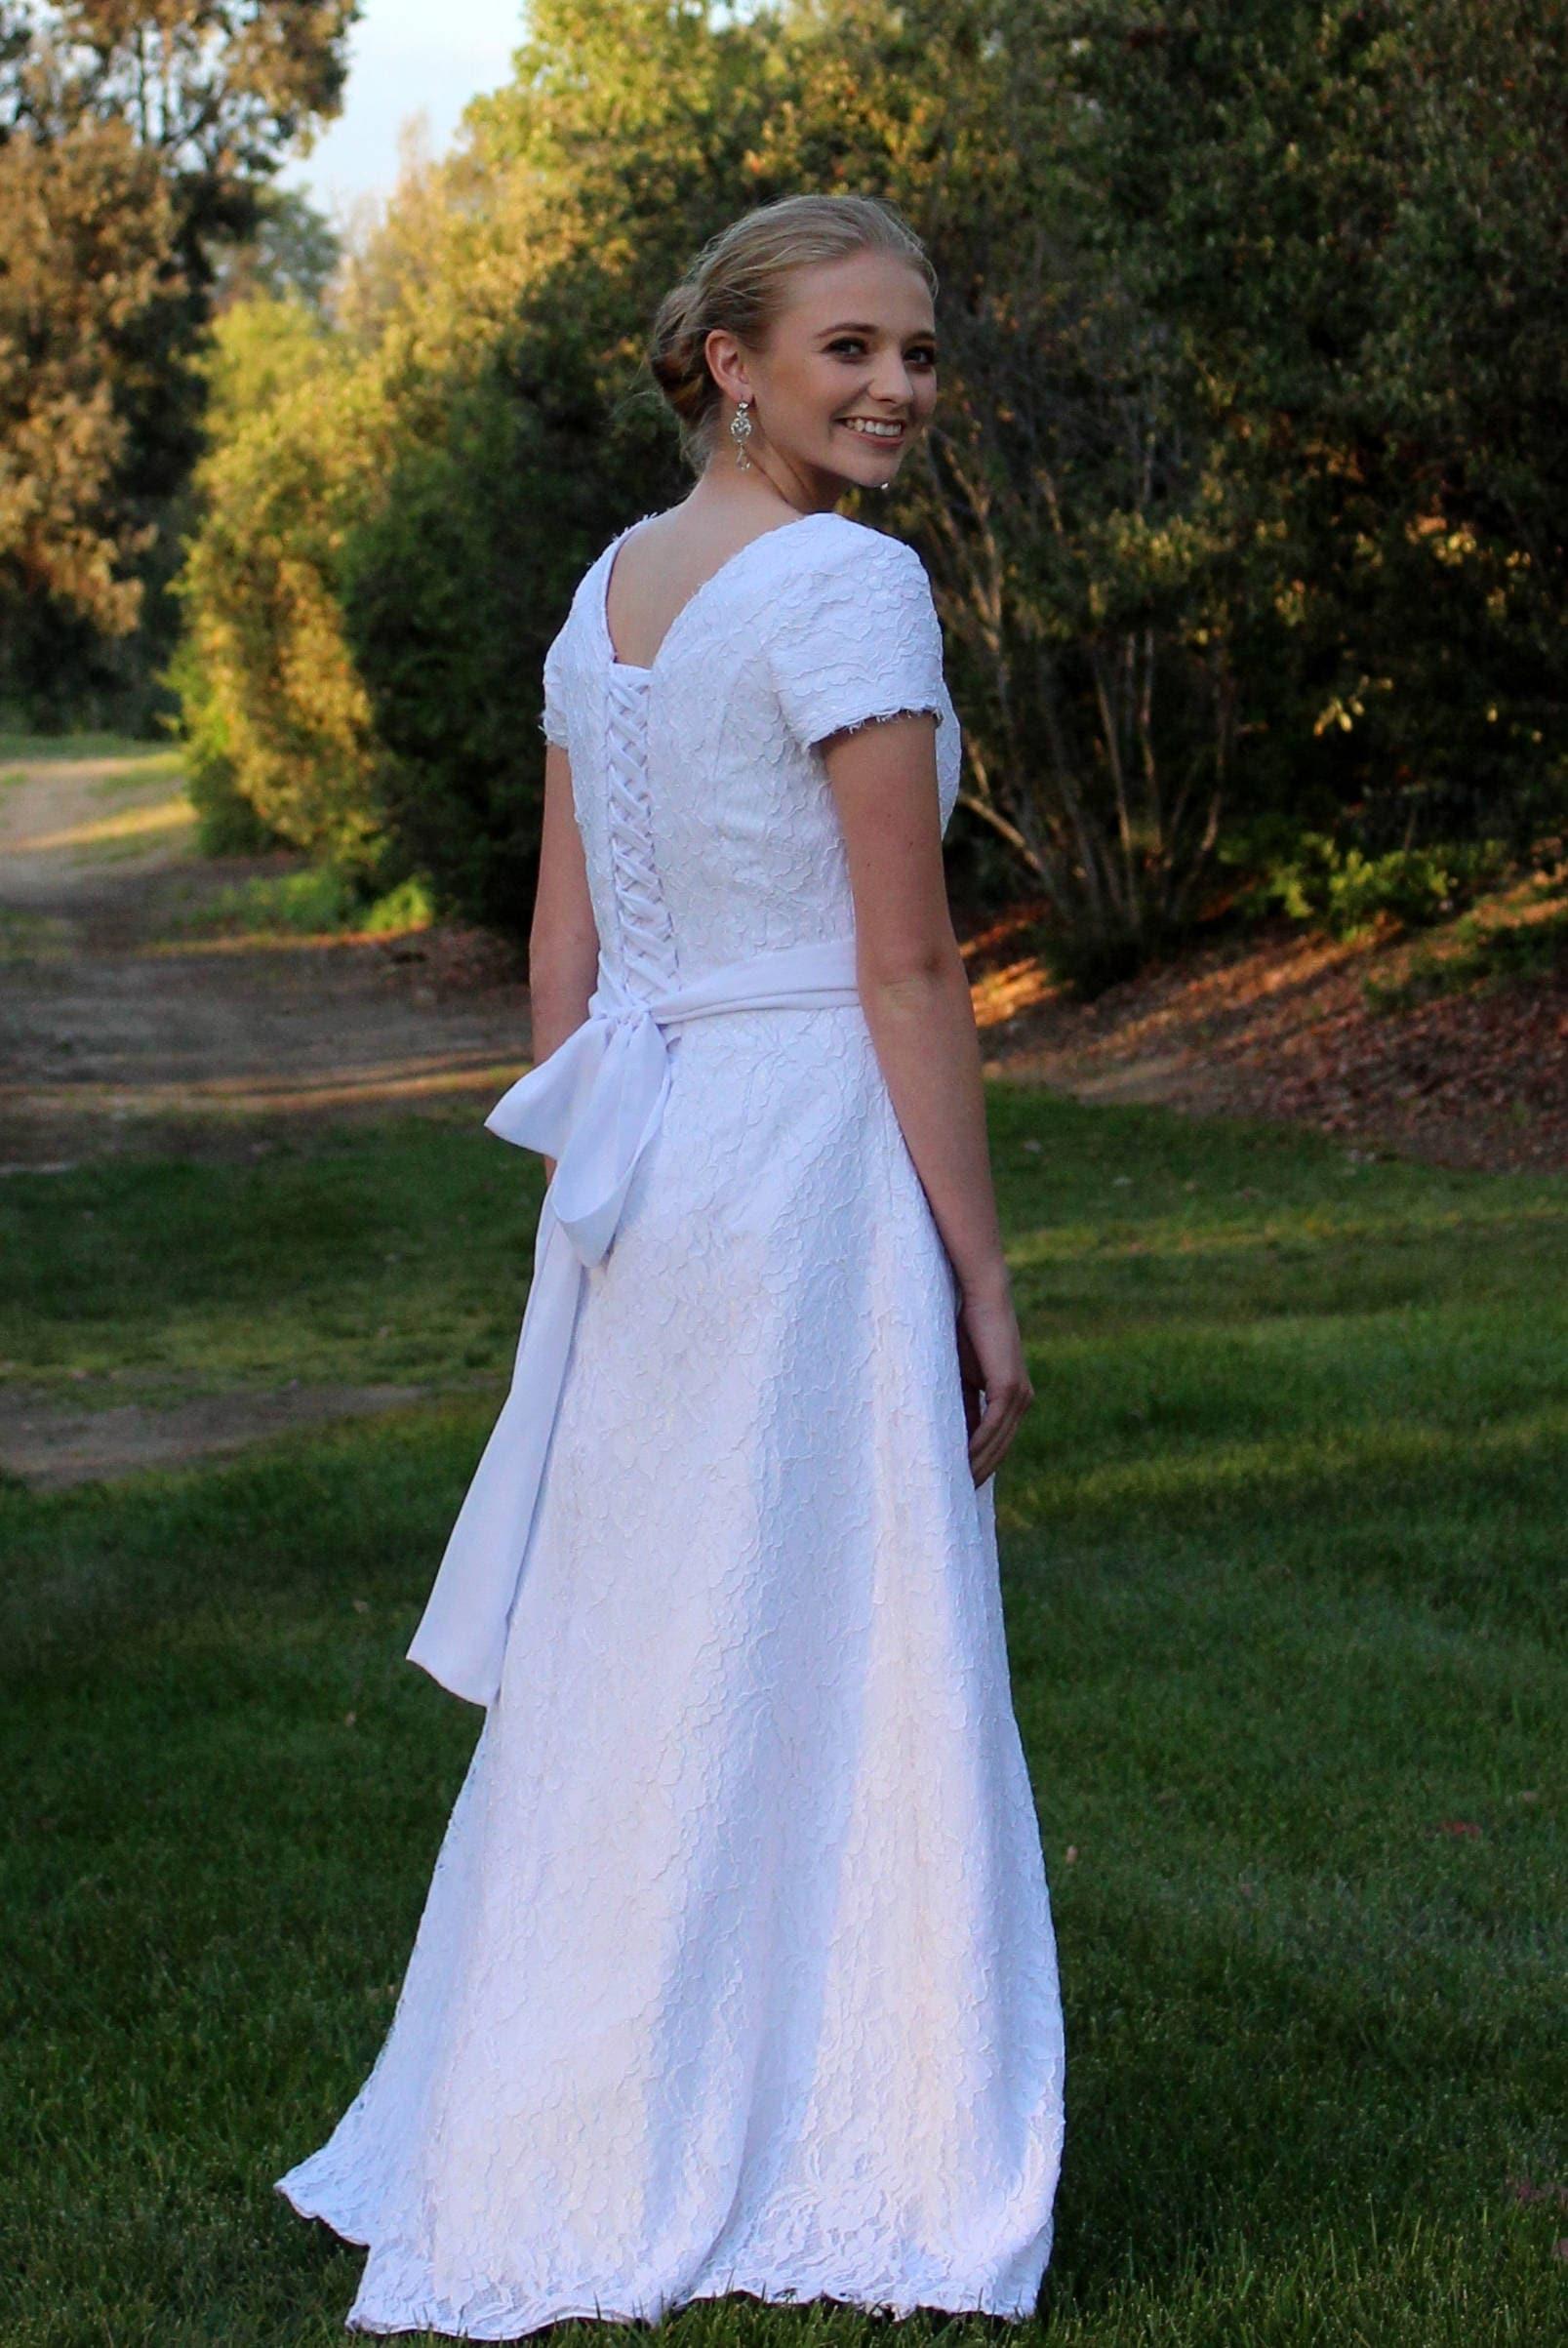 Kimberly Brautkleid maßgeschneiderte Brautkleid